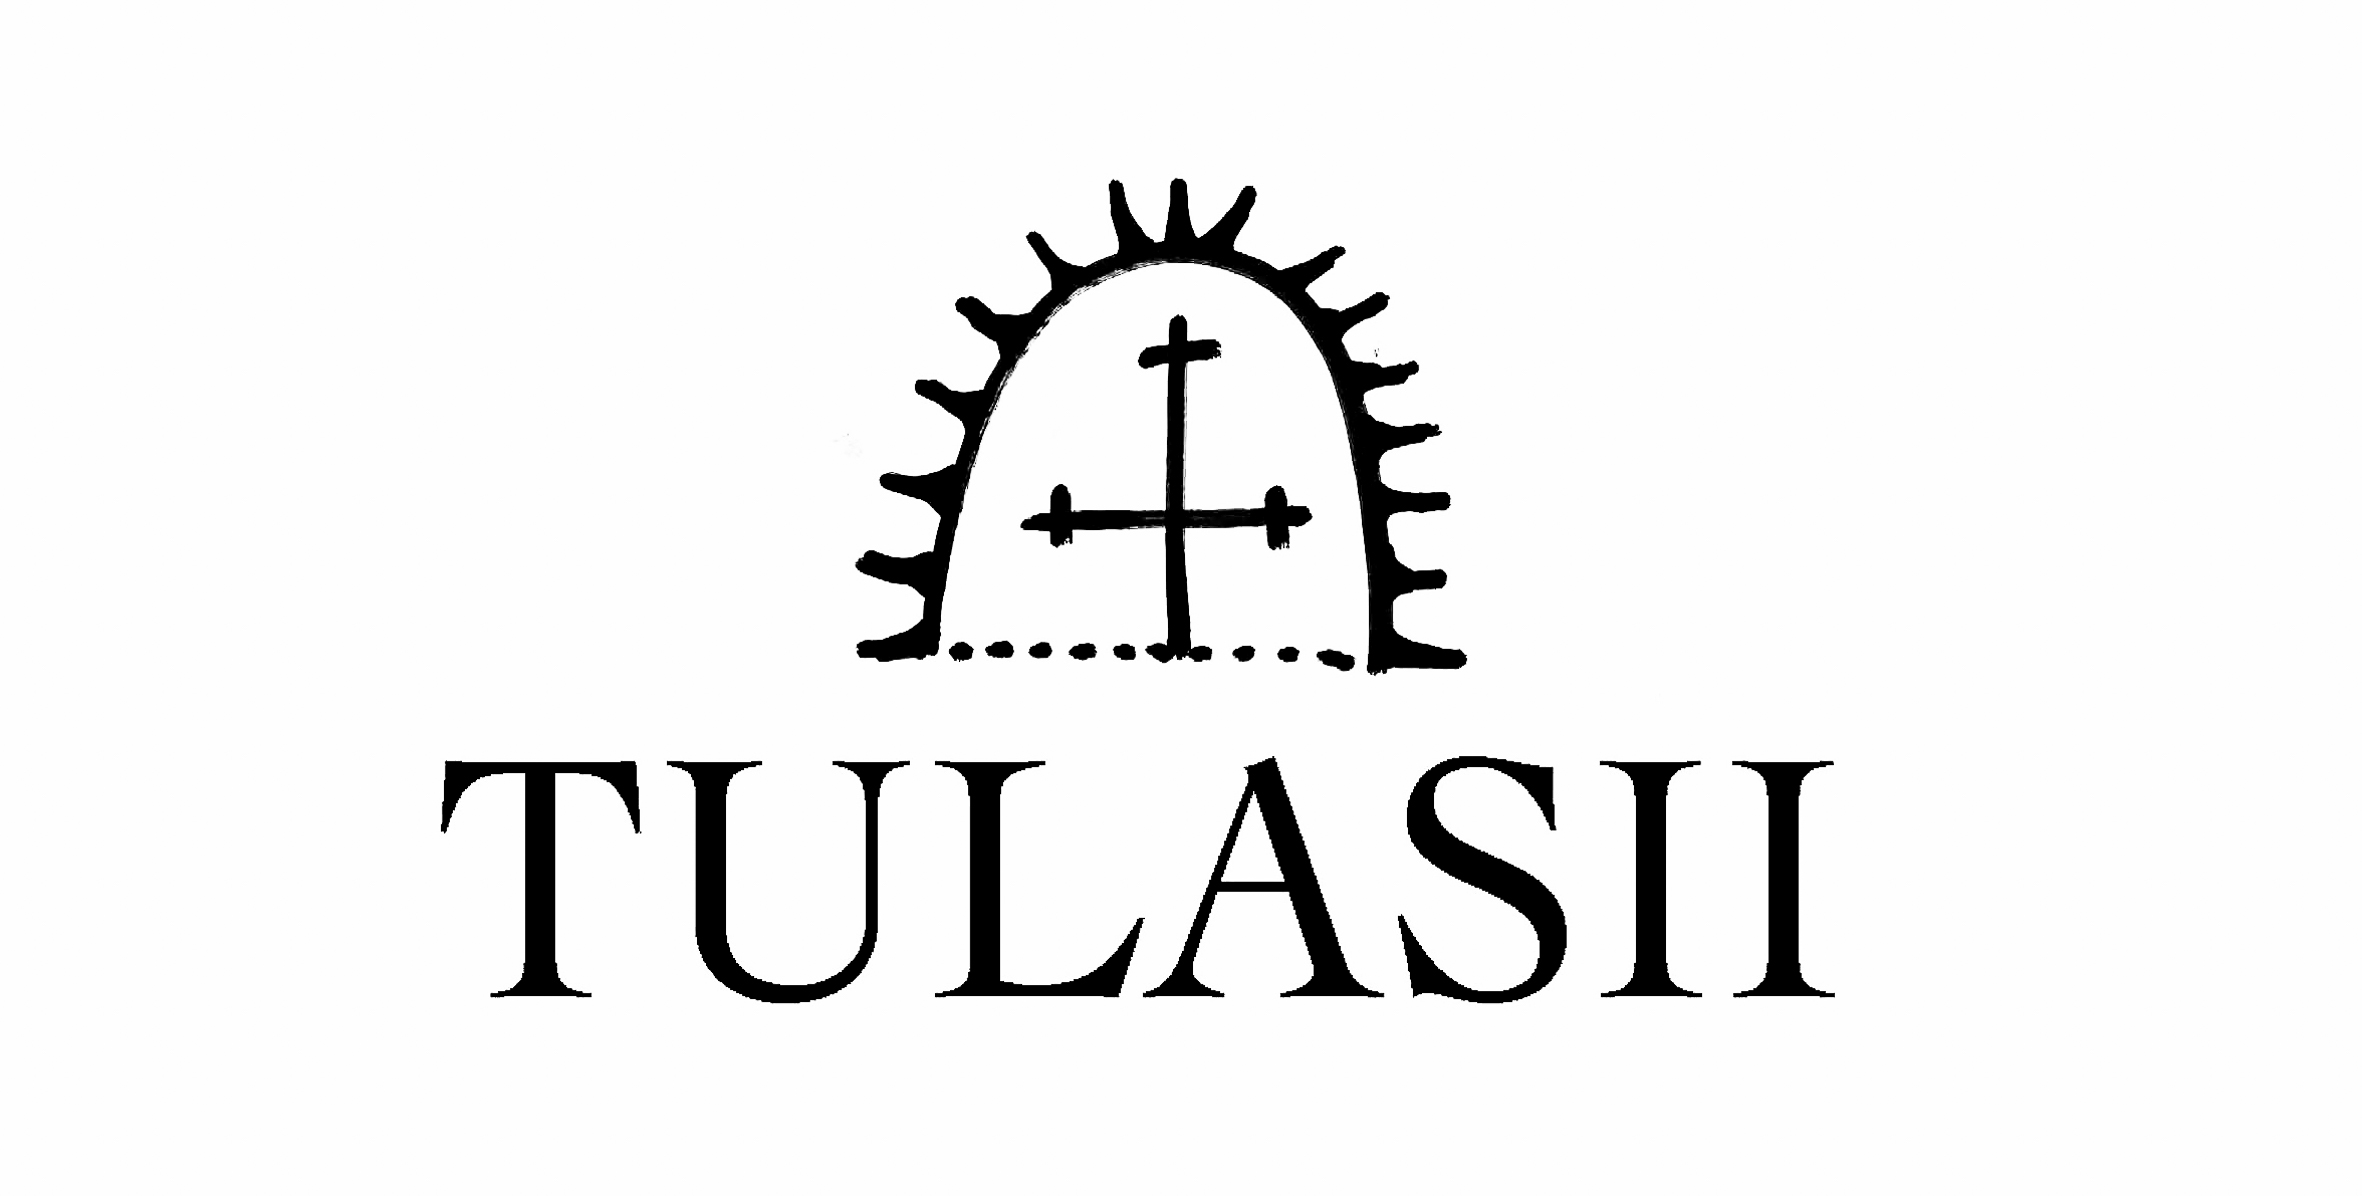 Tulasii logo B&W (1 of 1).jpg